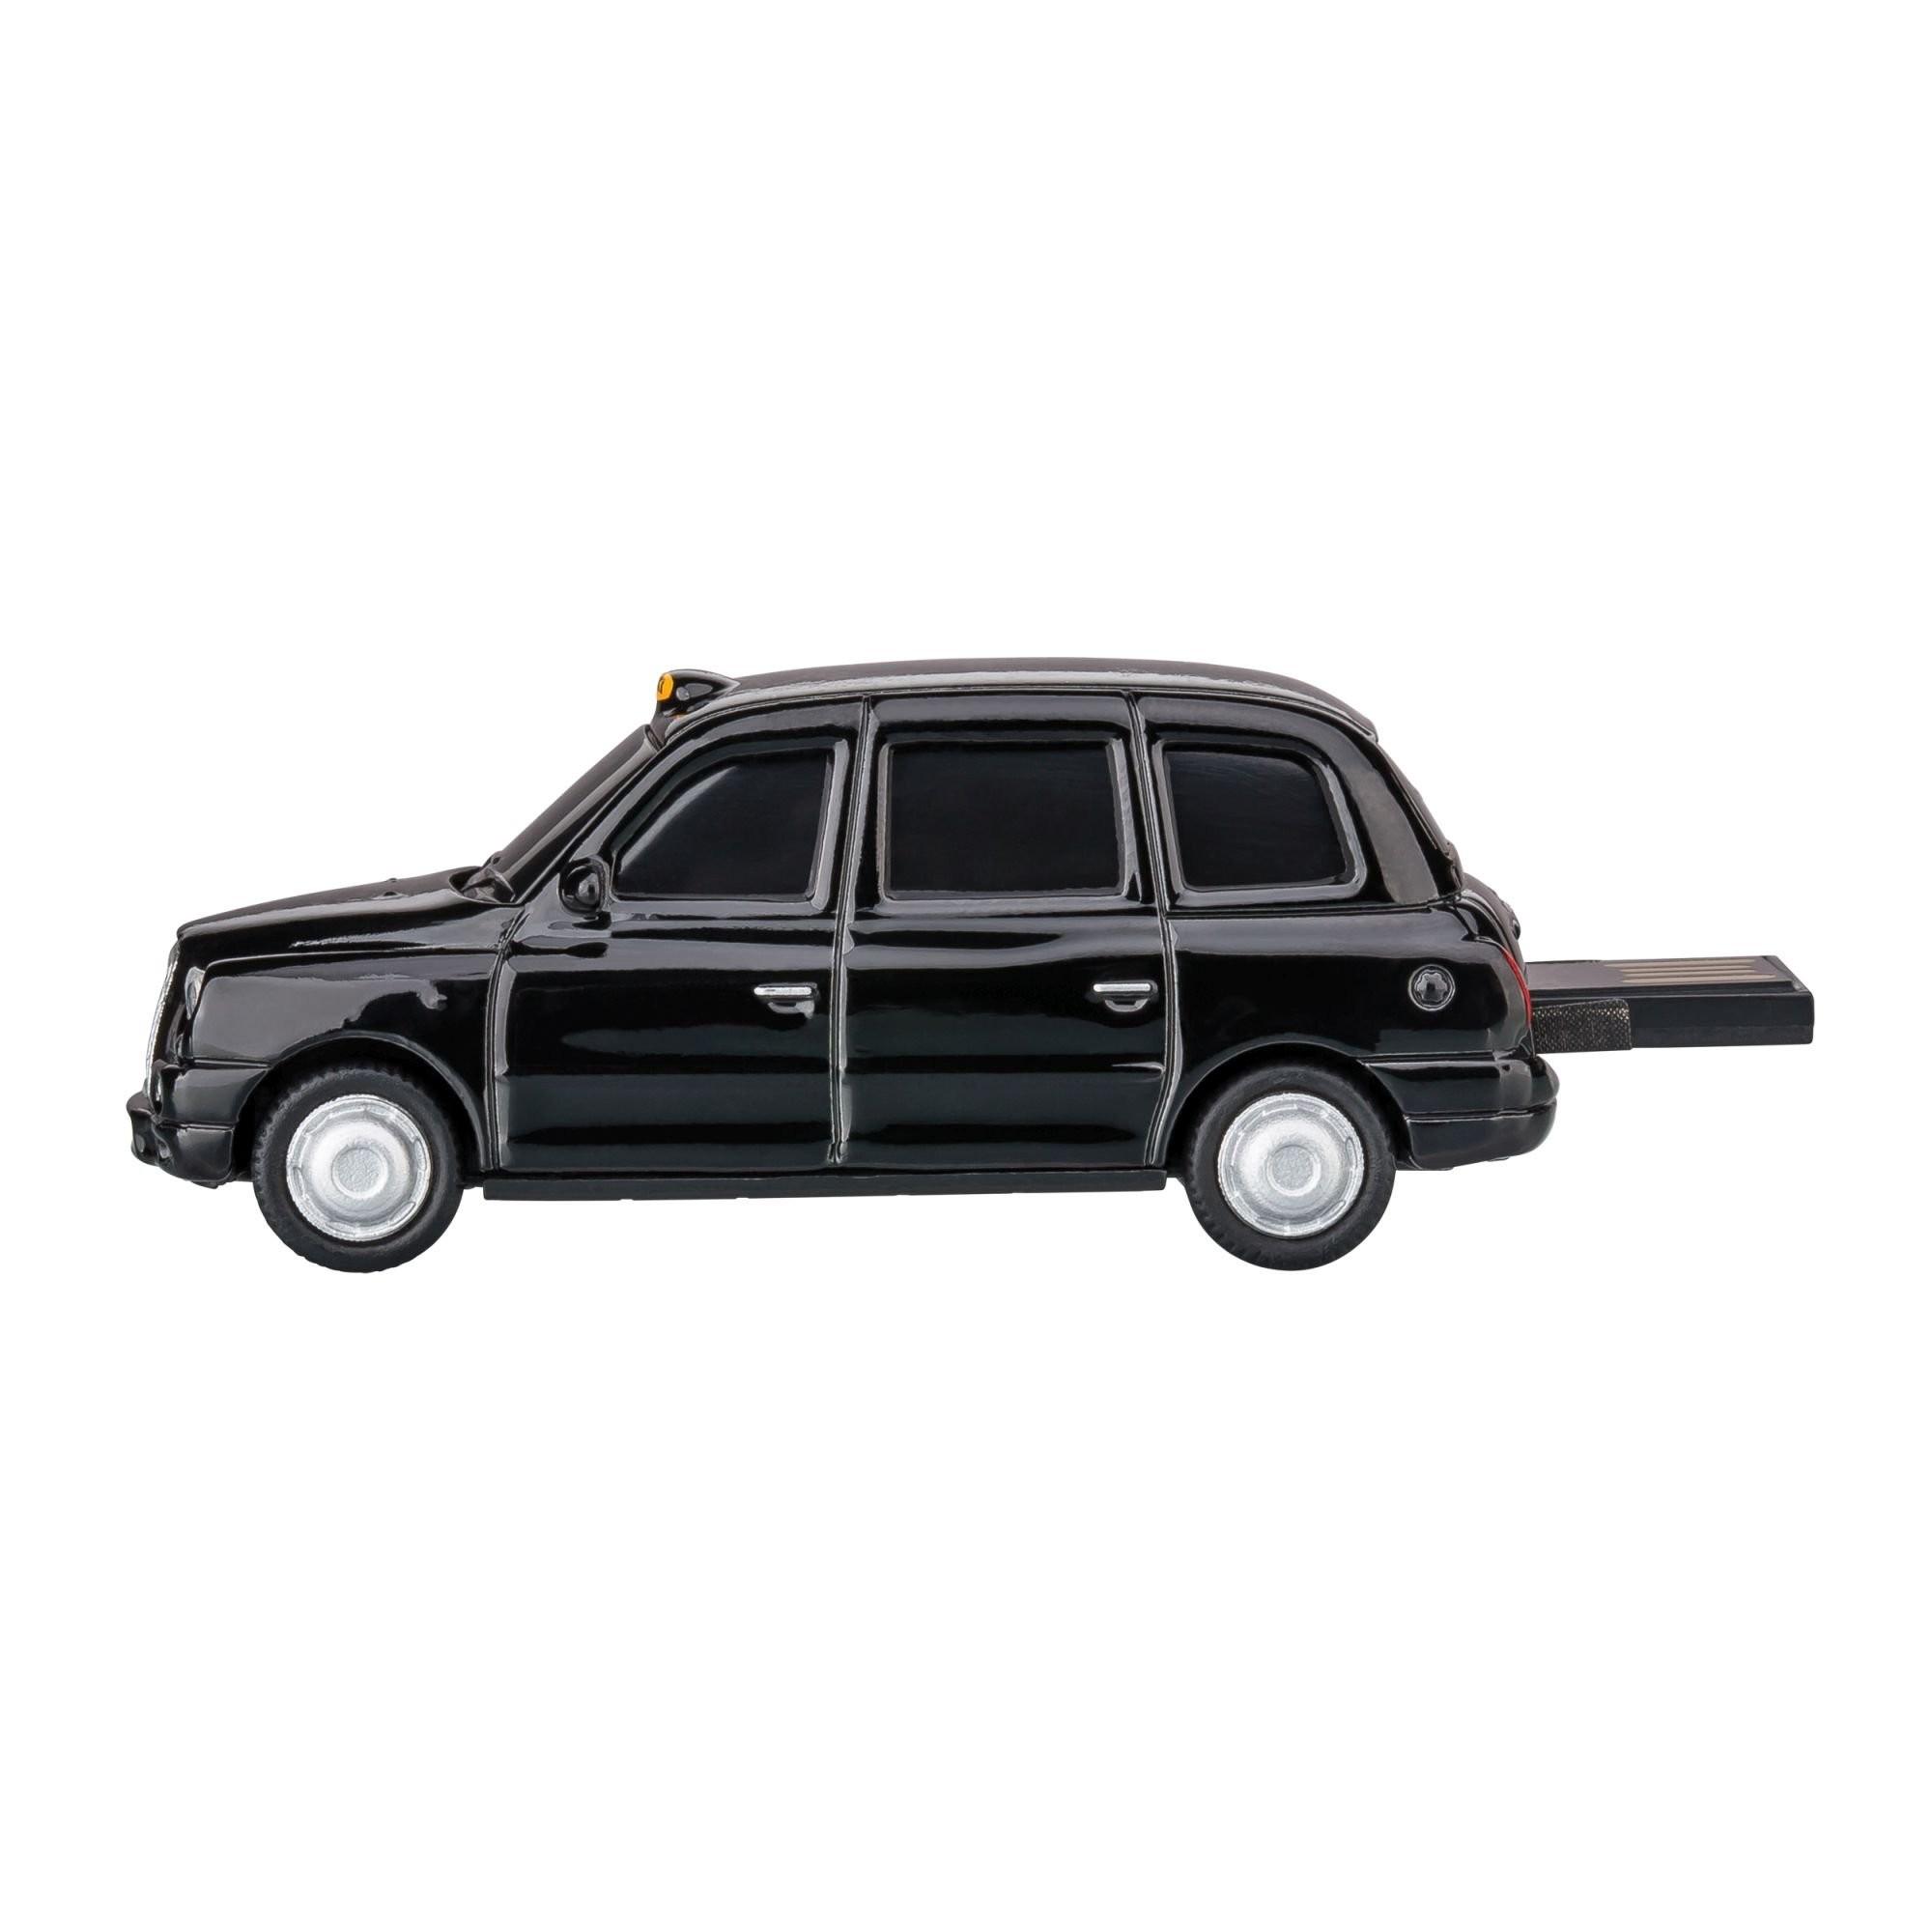 USB flash drive London Taxi TX4 1:72 BLACK 16GB, View 4